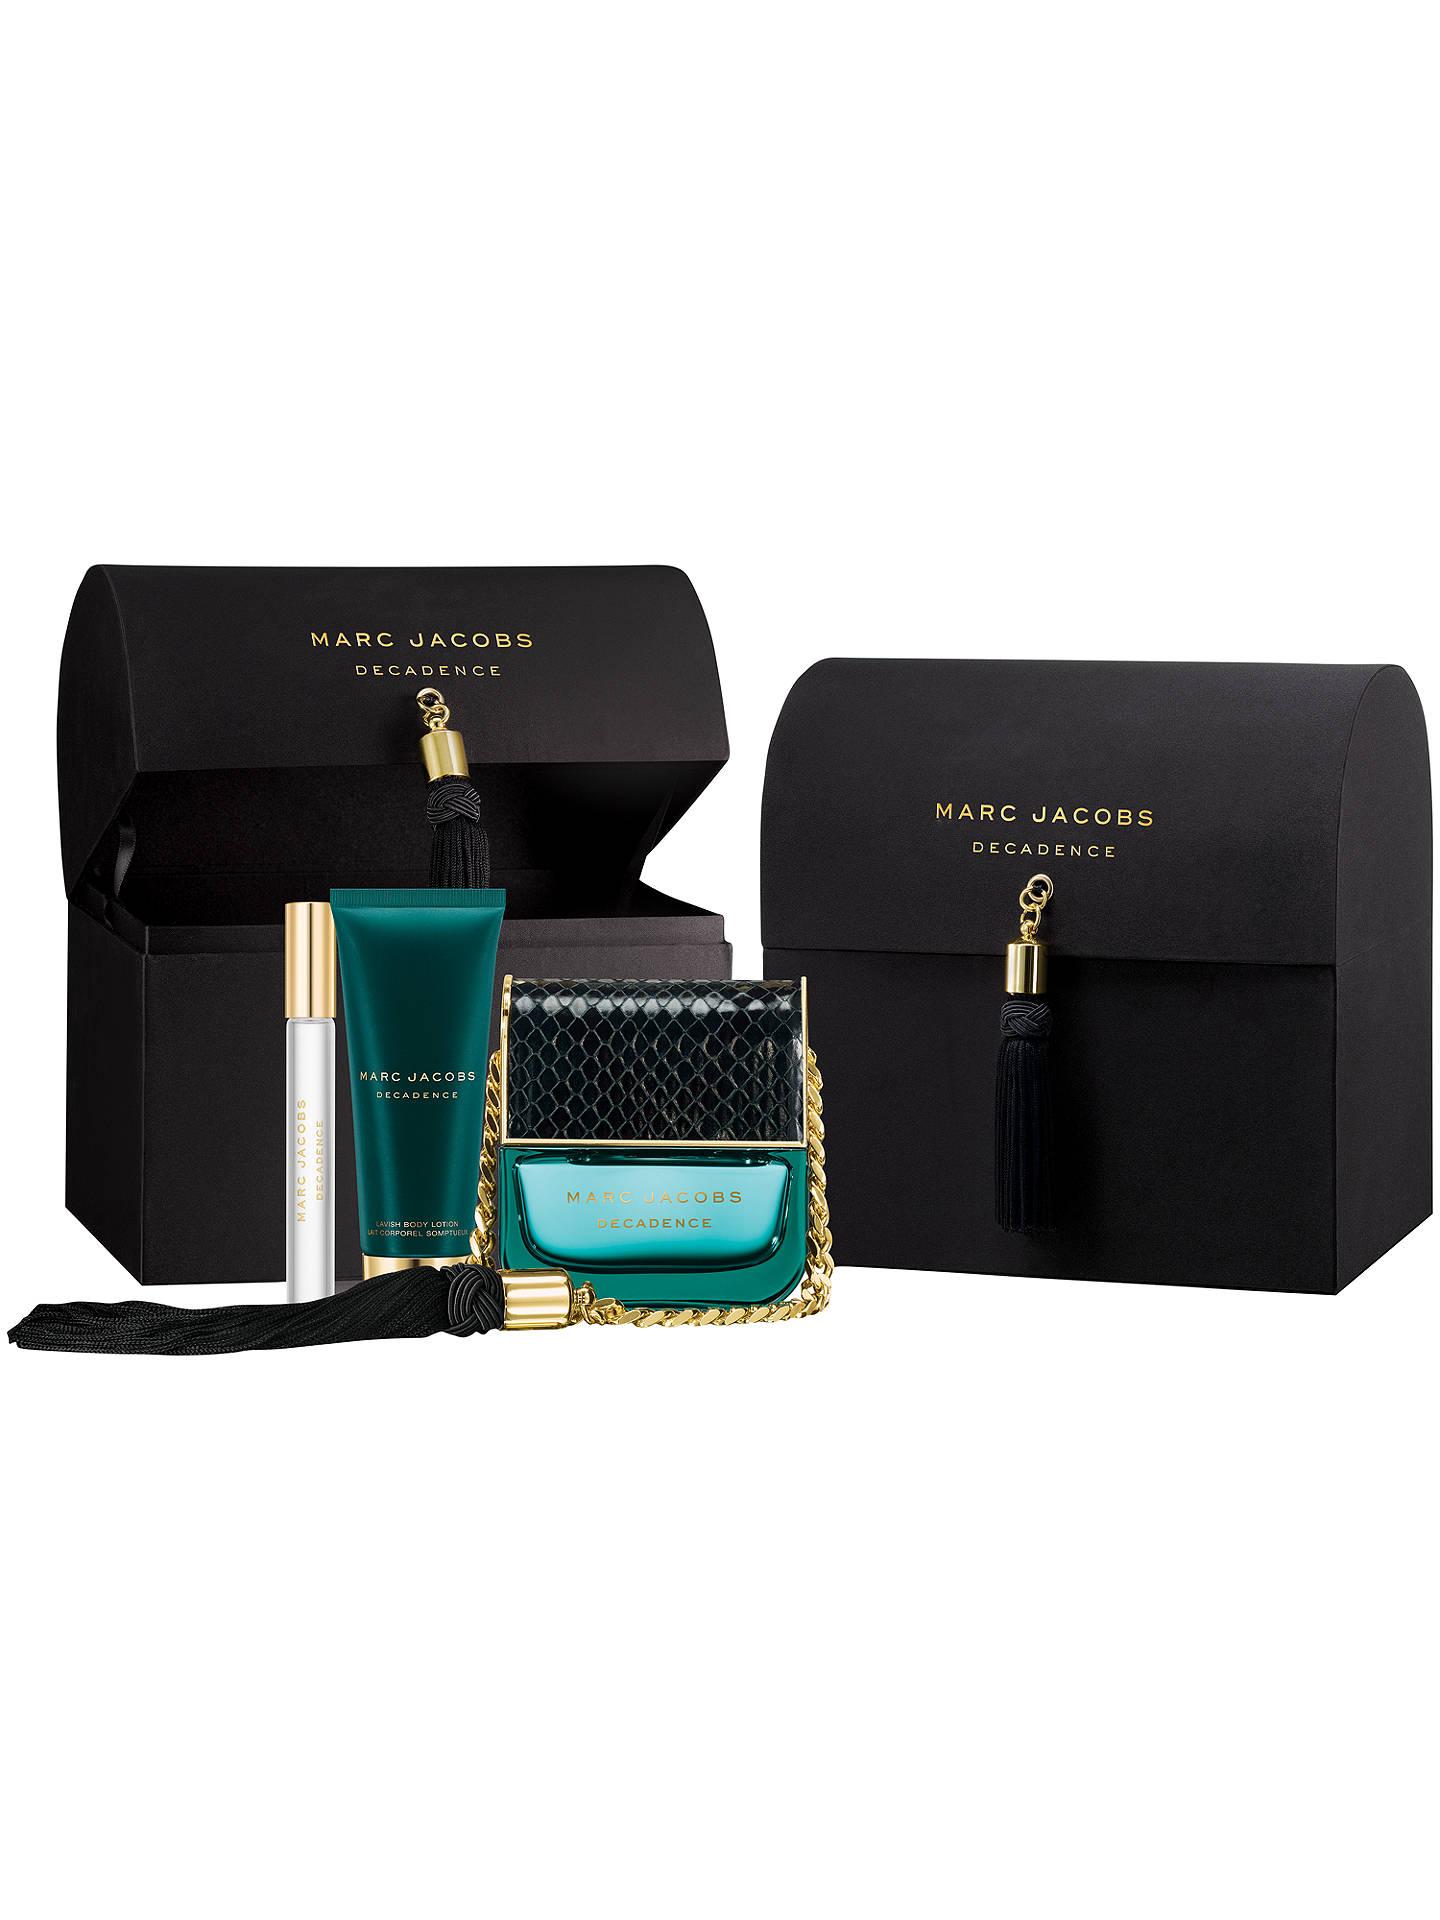 BuyMarc Jacobs Decadence 100ml Eau de Parfum Fragrance Gift Set Online at  johnlewis.com 5b4fa75cabb2